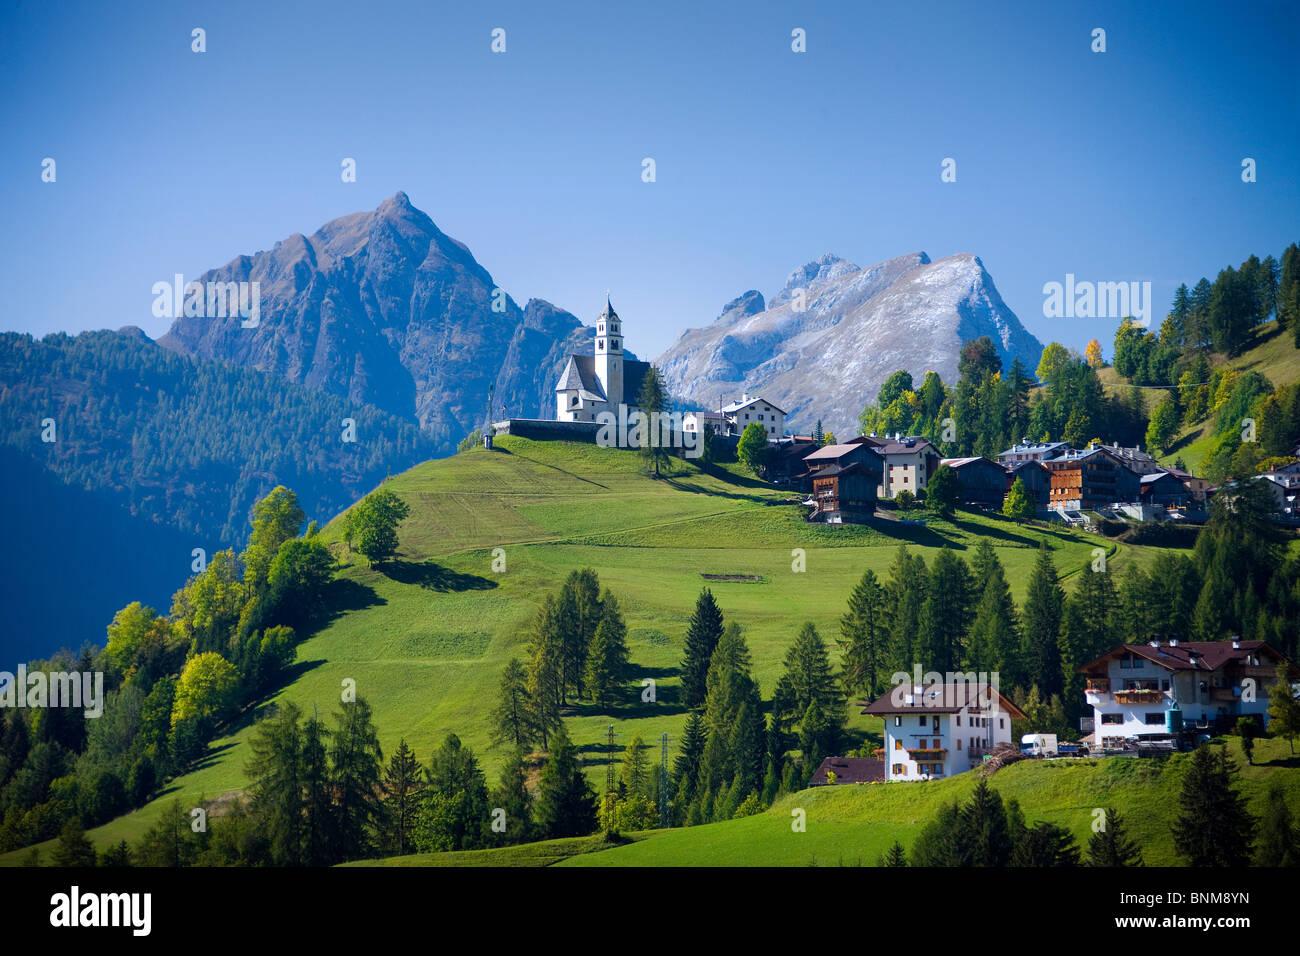 Italia Alpes Dolomitas Veneto Cadore hill wood forest meadows holidays travel, Imagen De Stock